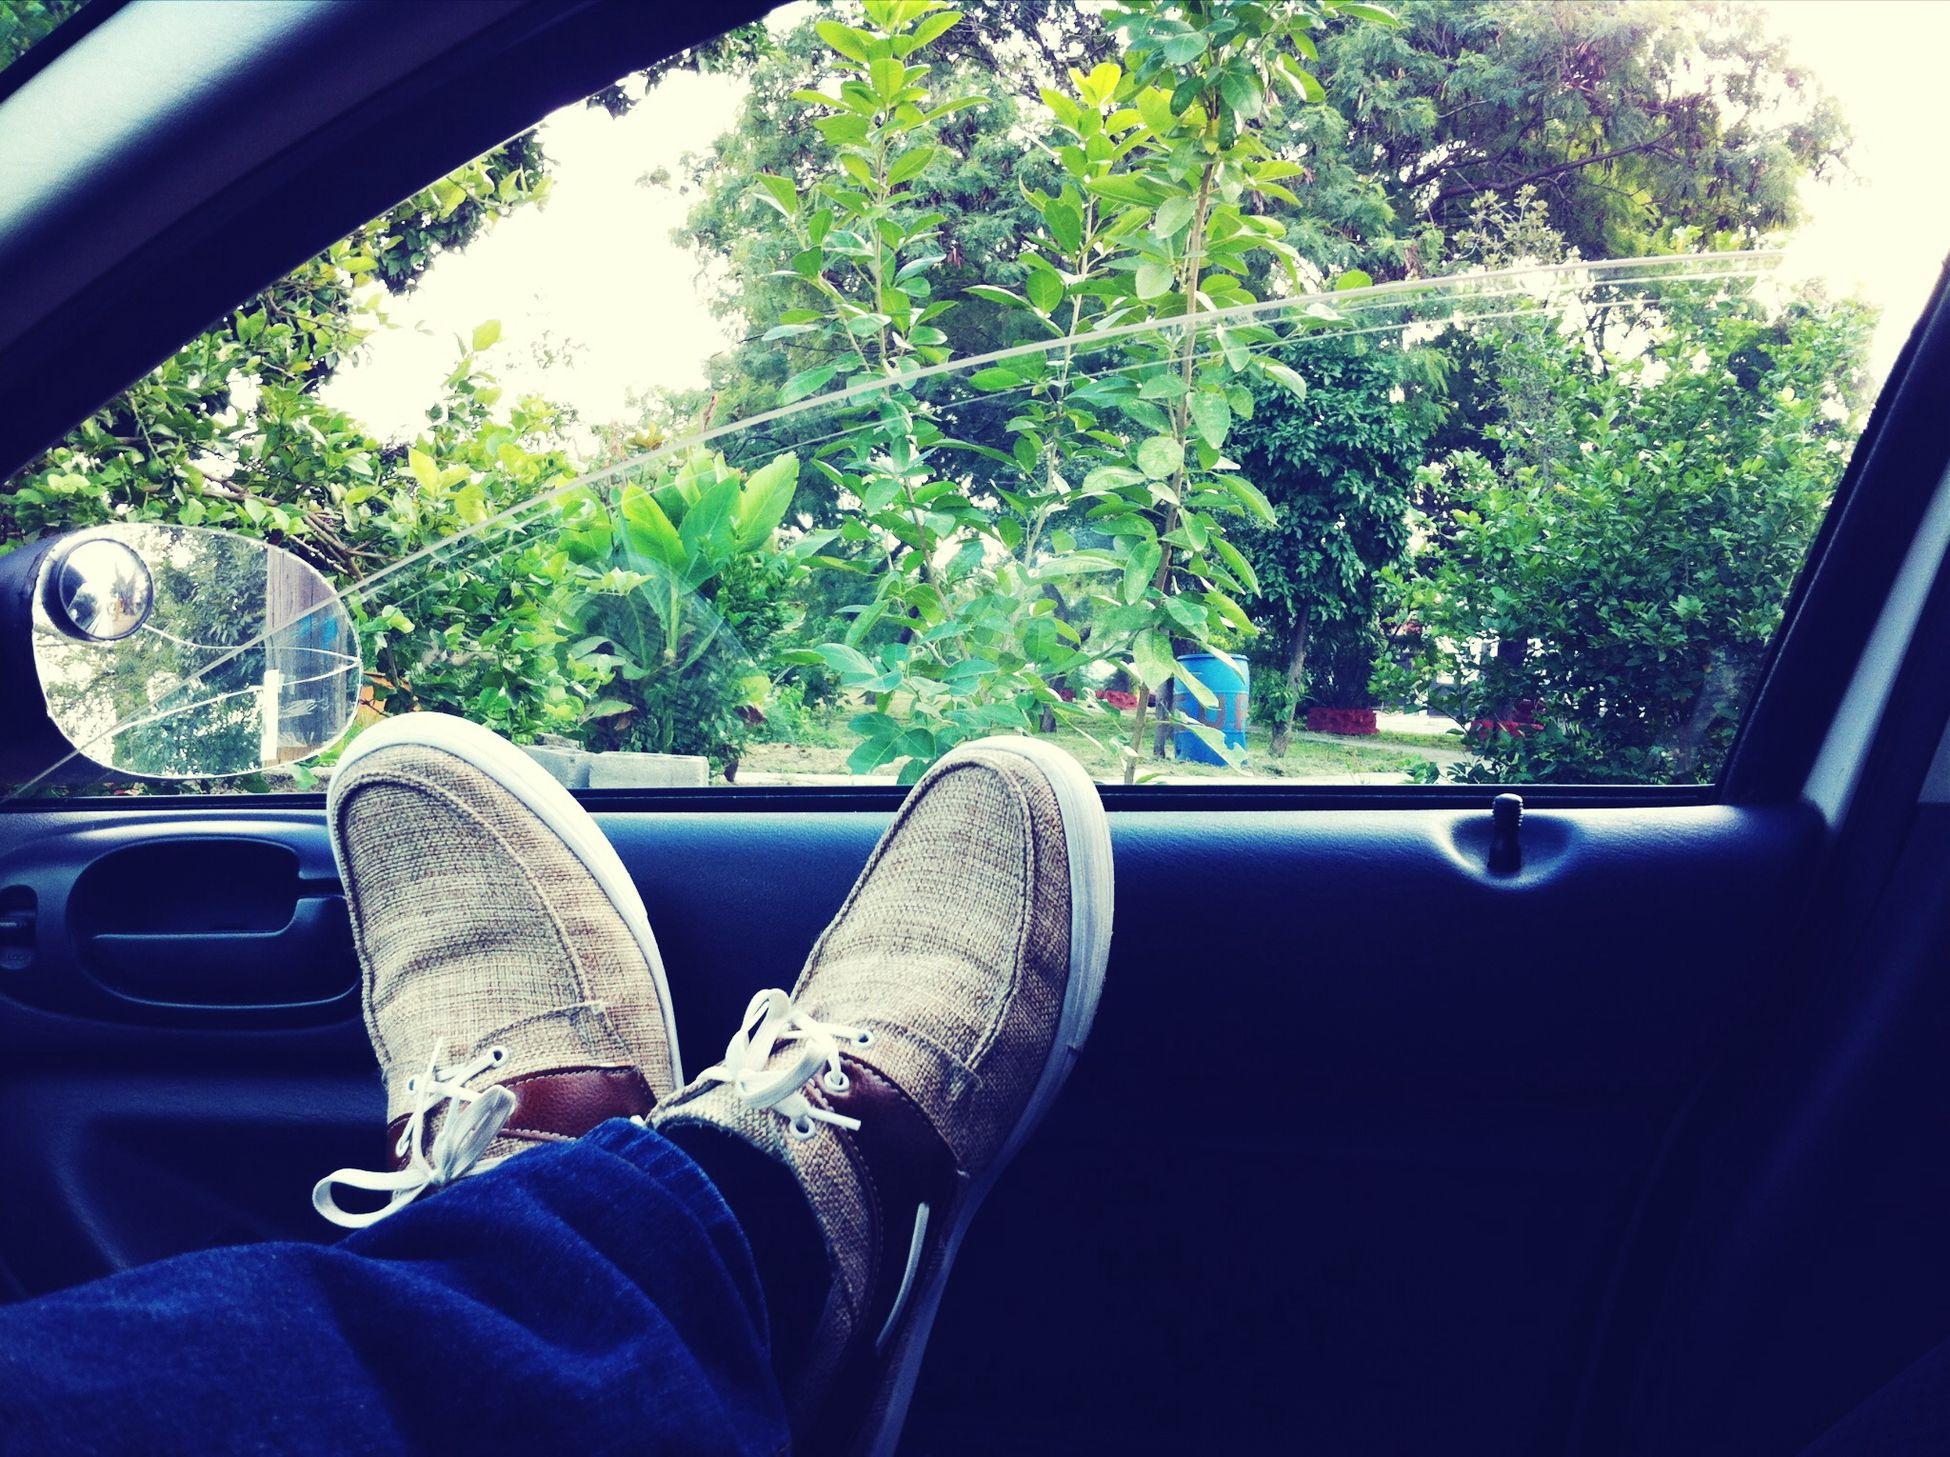 Wating Relaxing Car Sunset